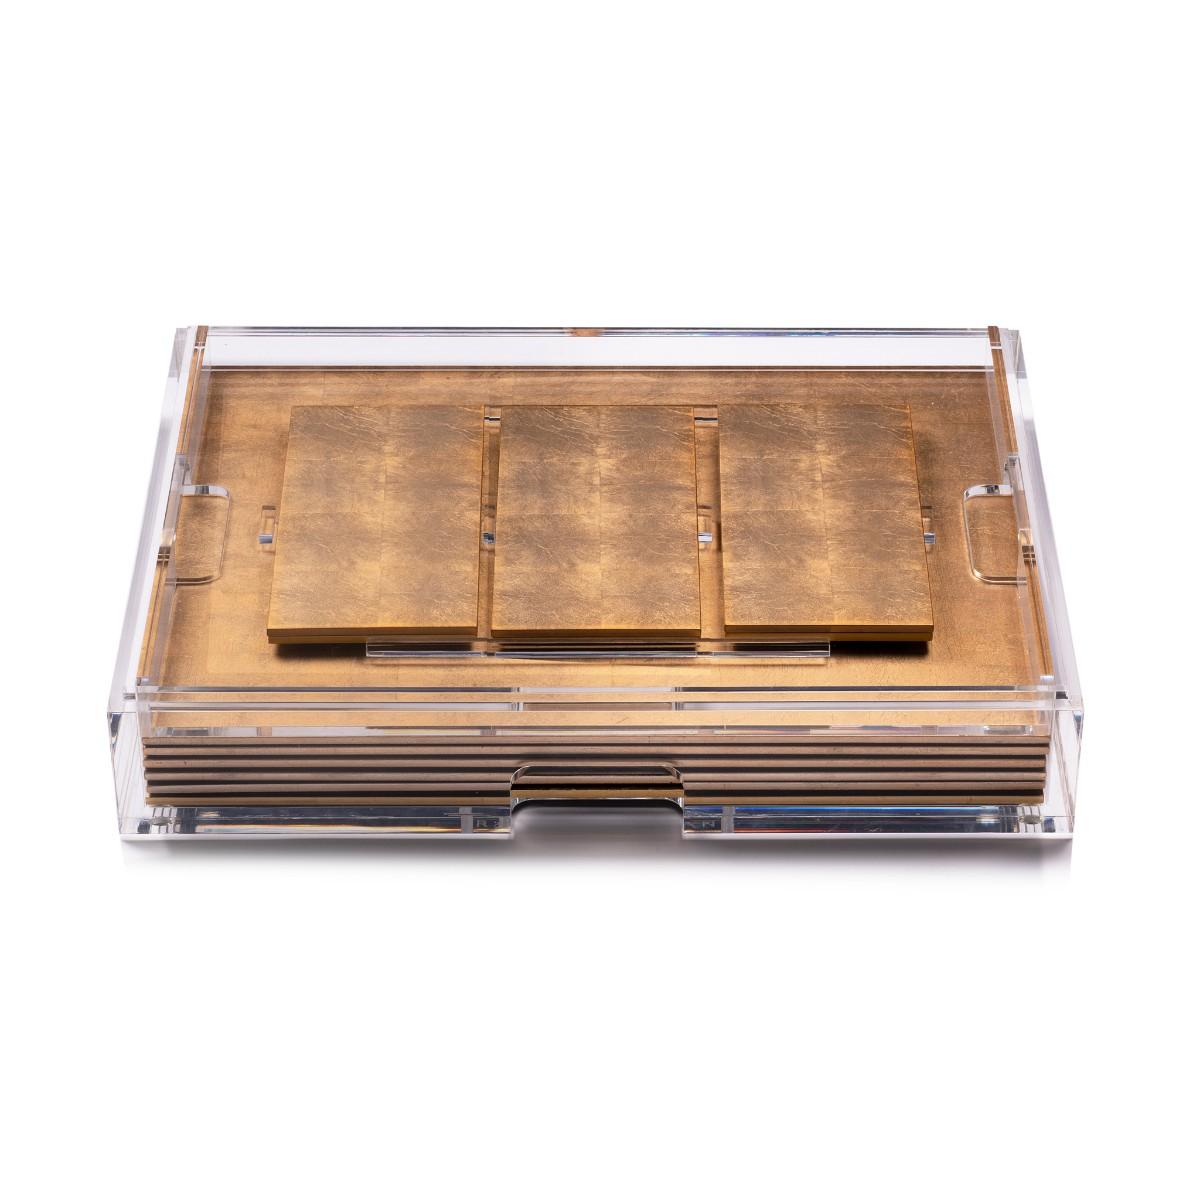 Posh Trading I Clear Grand Matbox I Silver Leaf Matte Gold